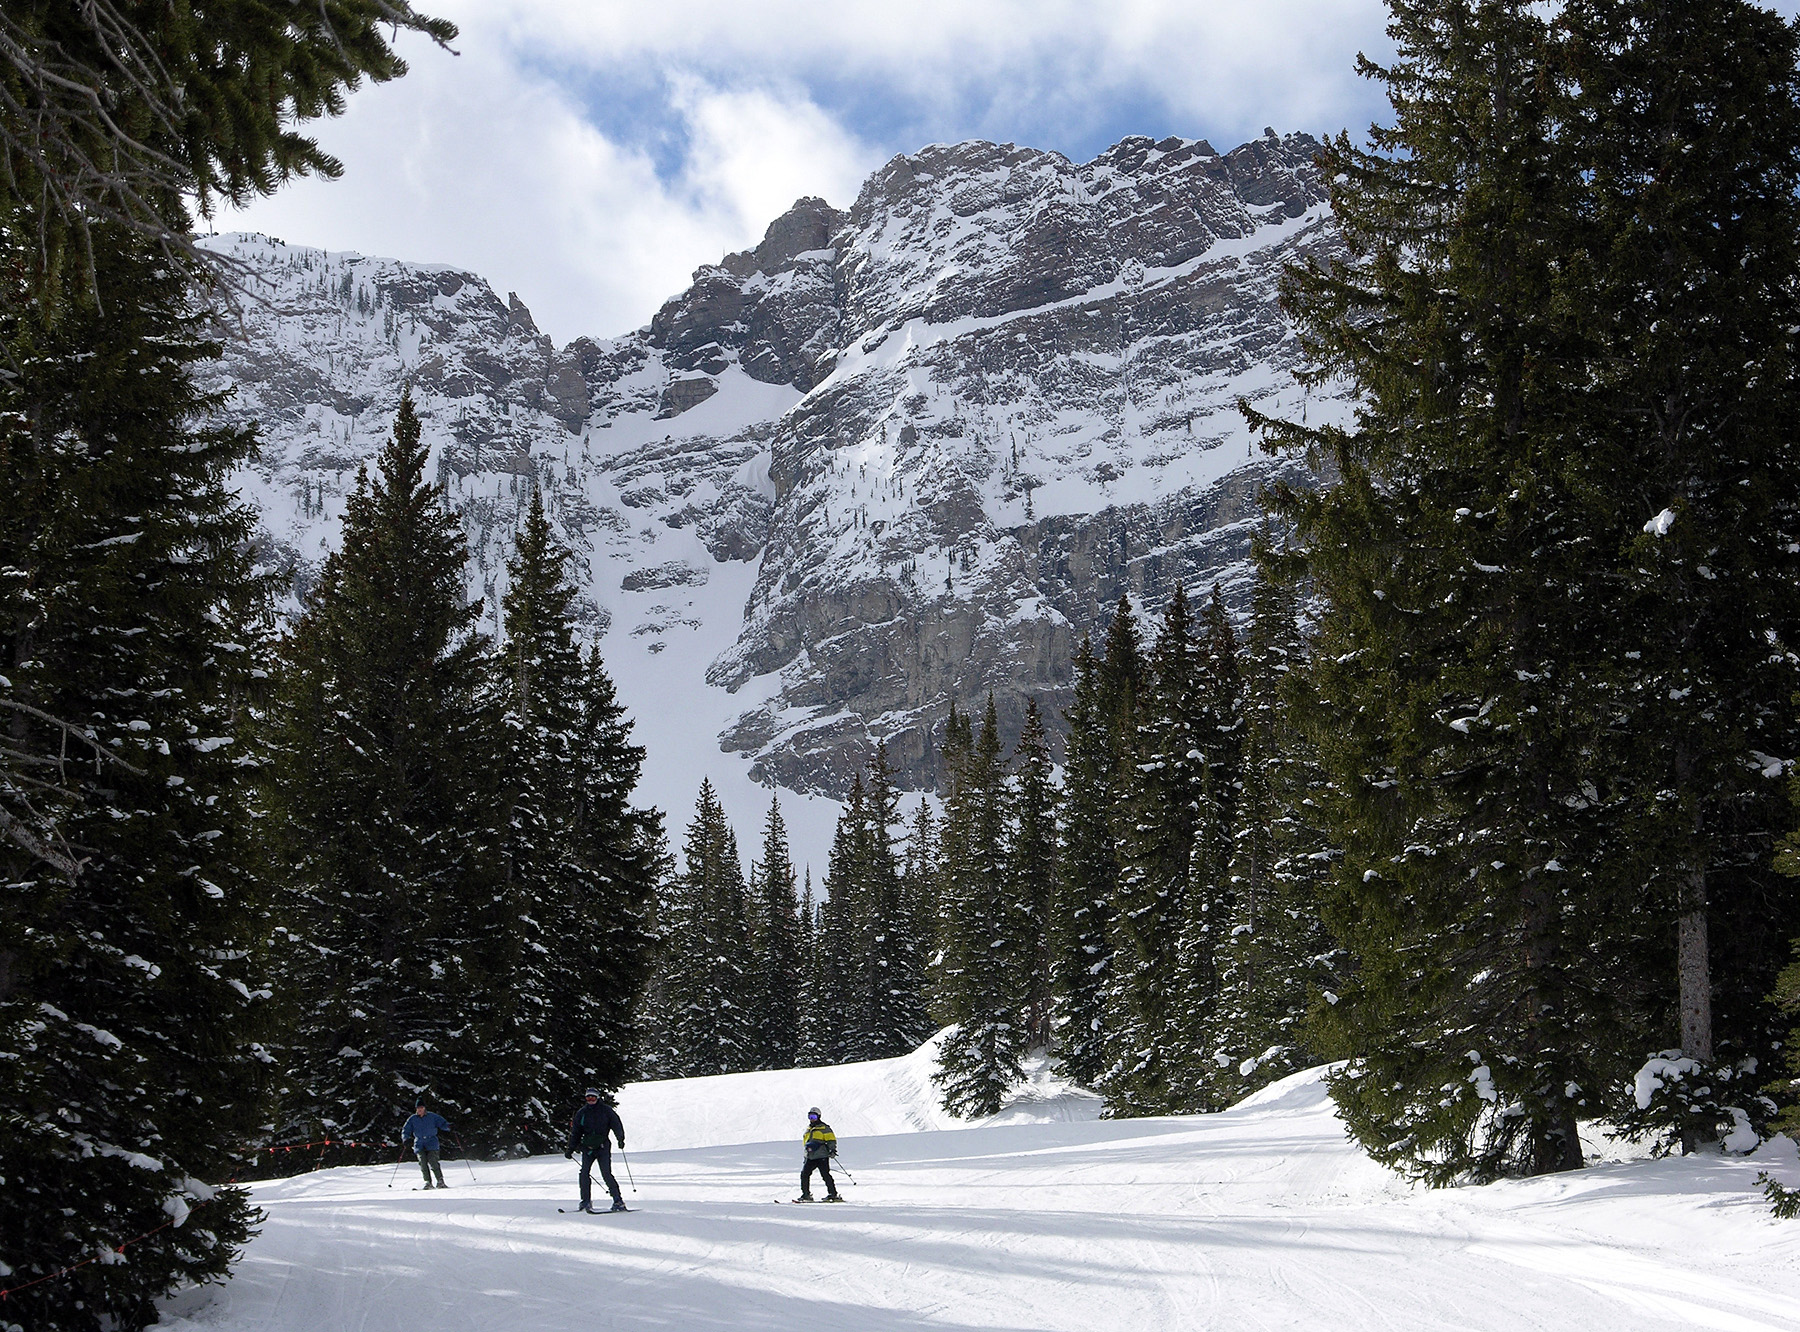 A family skiing at Alta Resort in Salt Lake City.